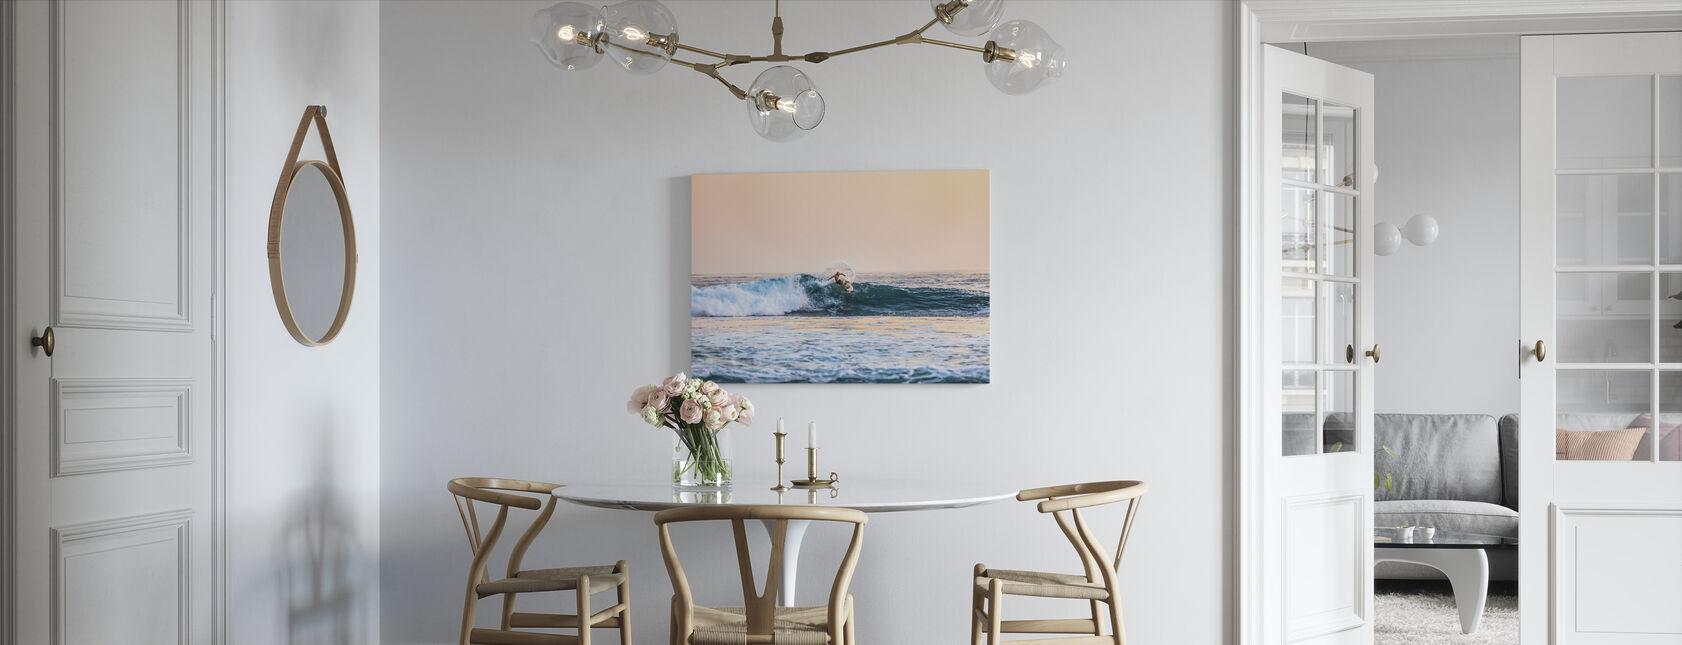 Surfen - Leinwandbild - Küchen